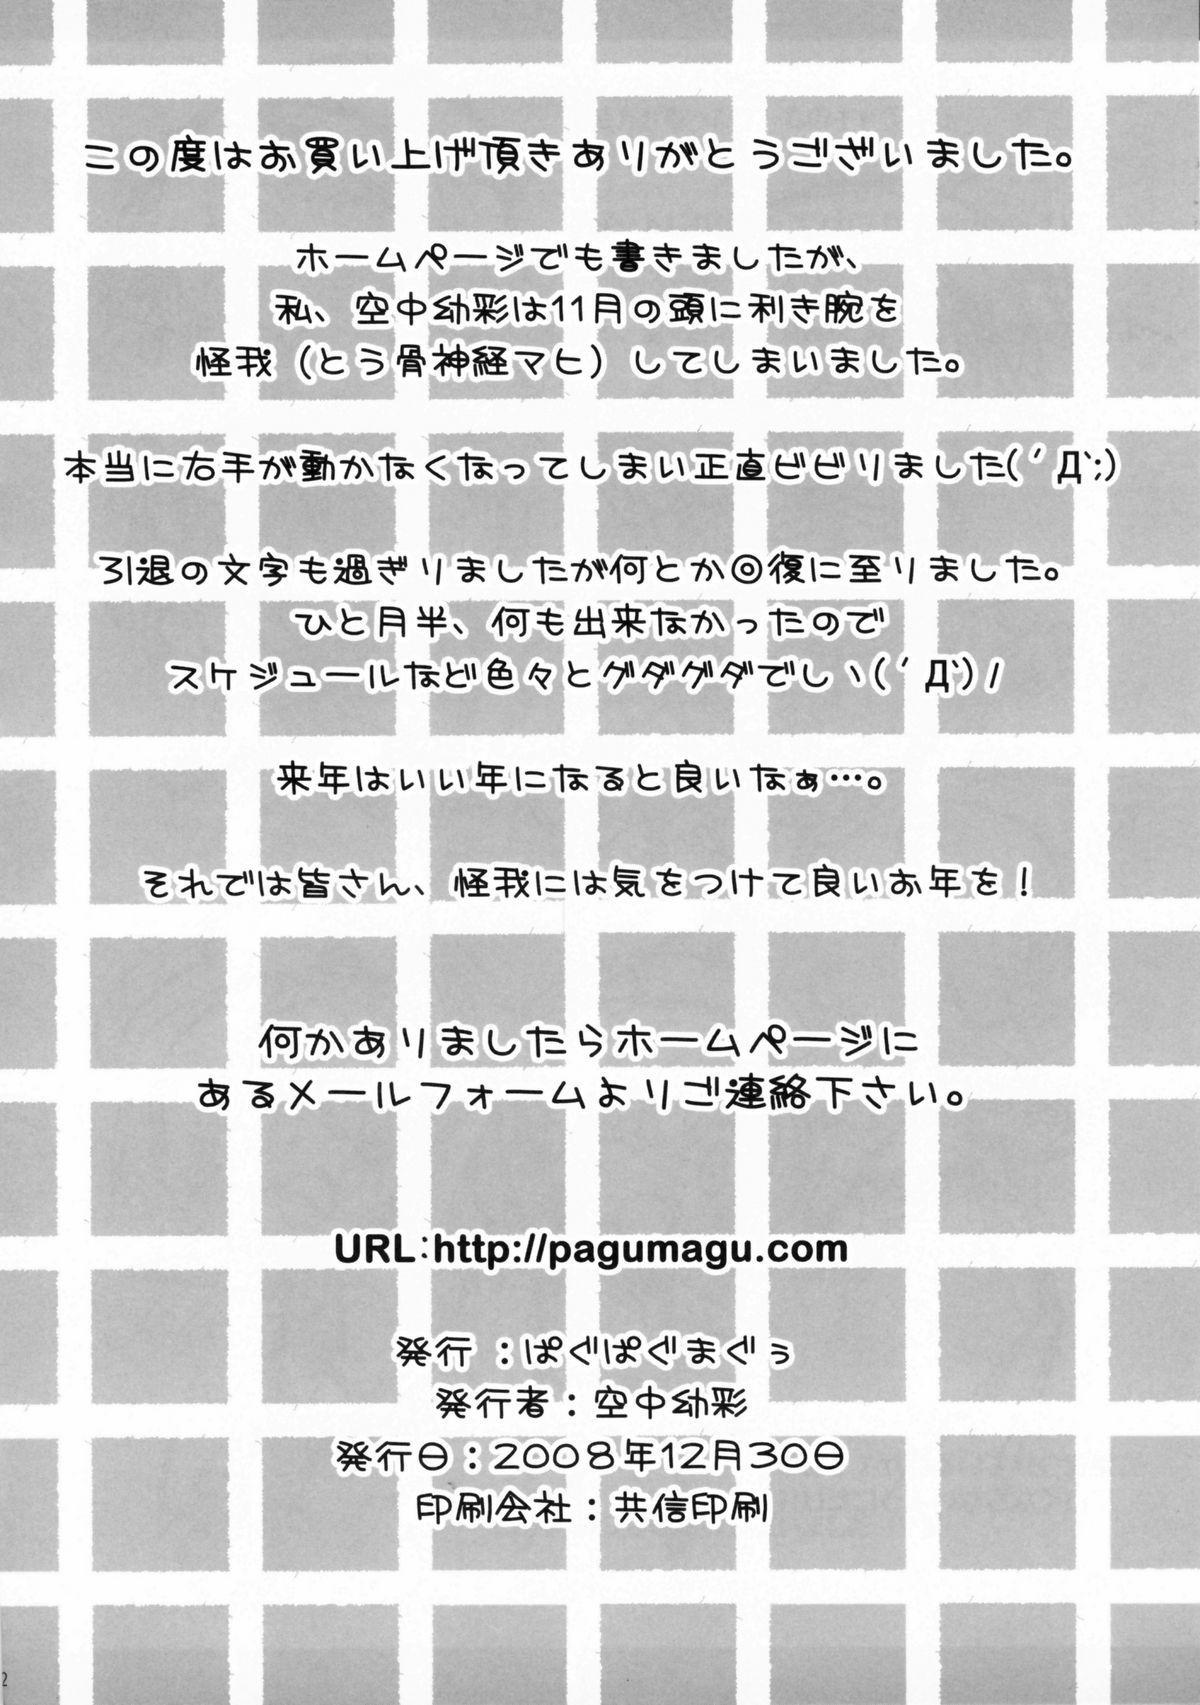 Oshigoto Rafunooto 20